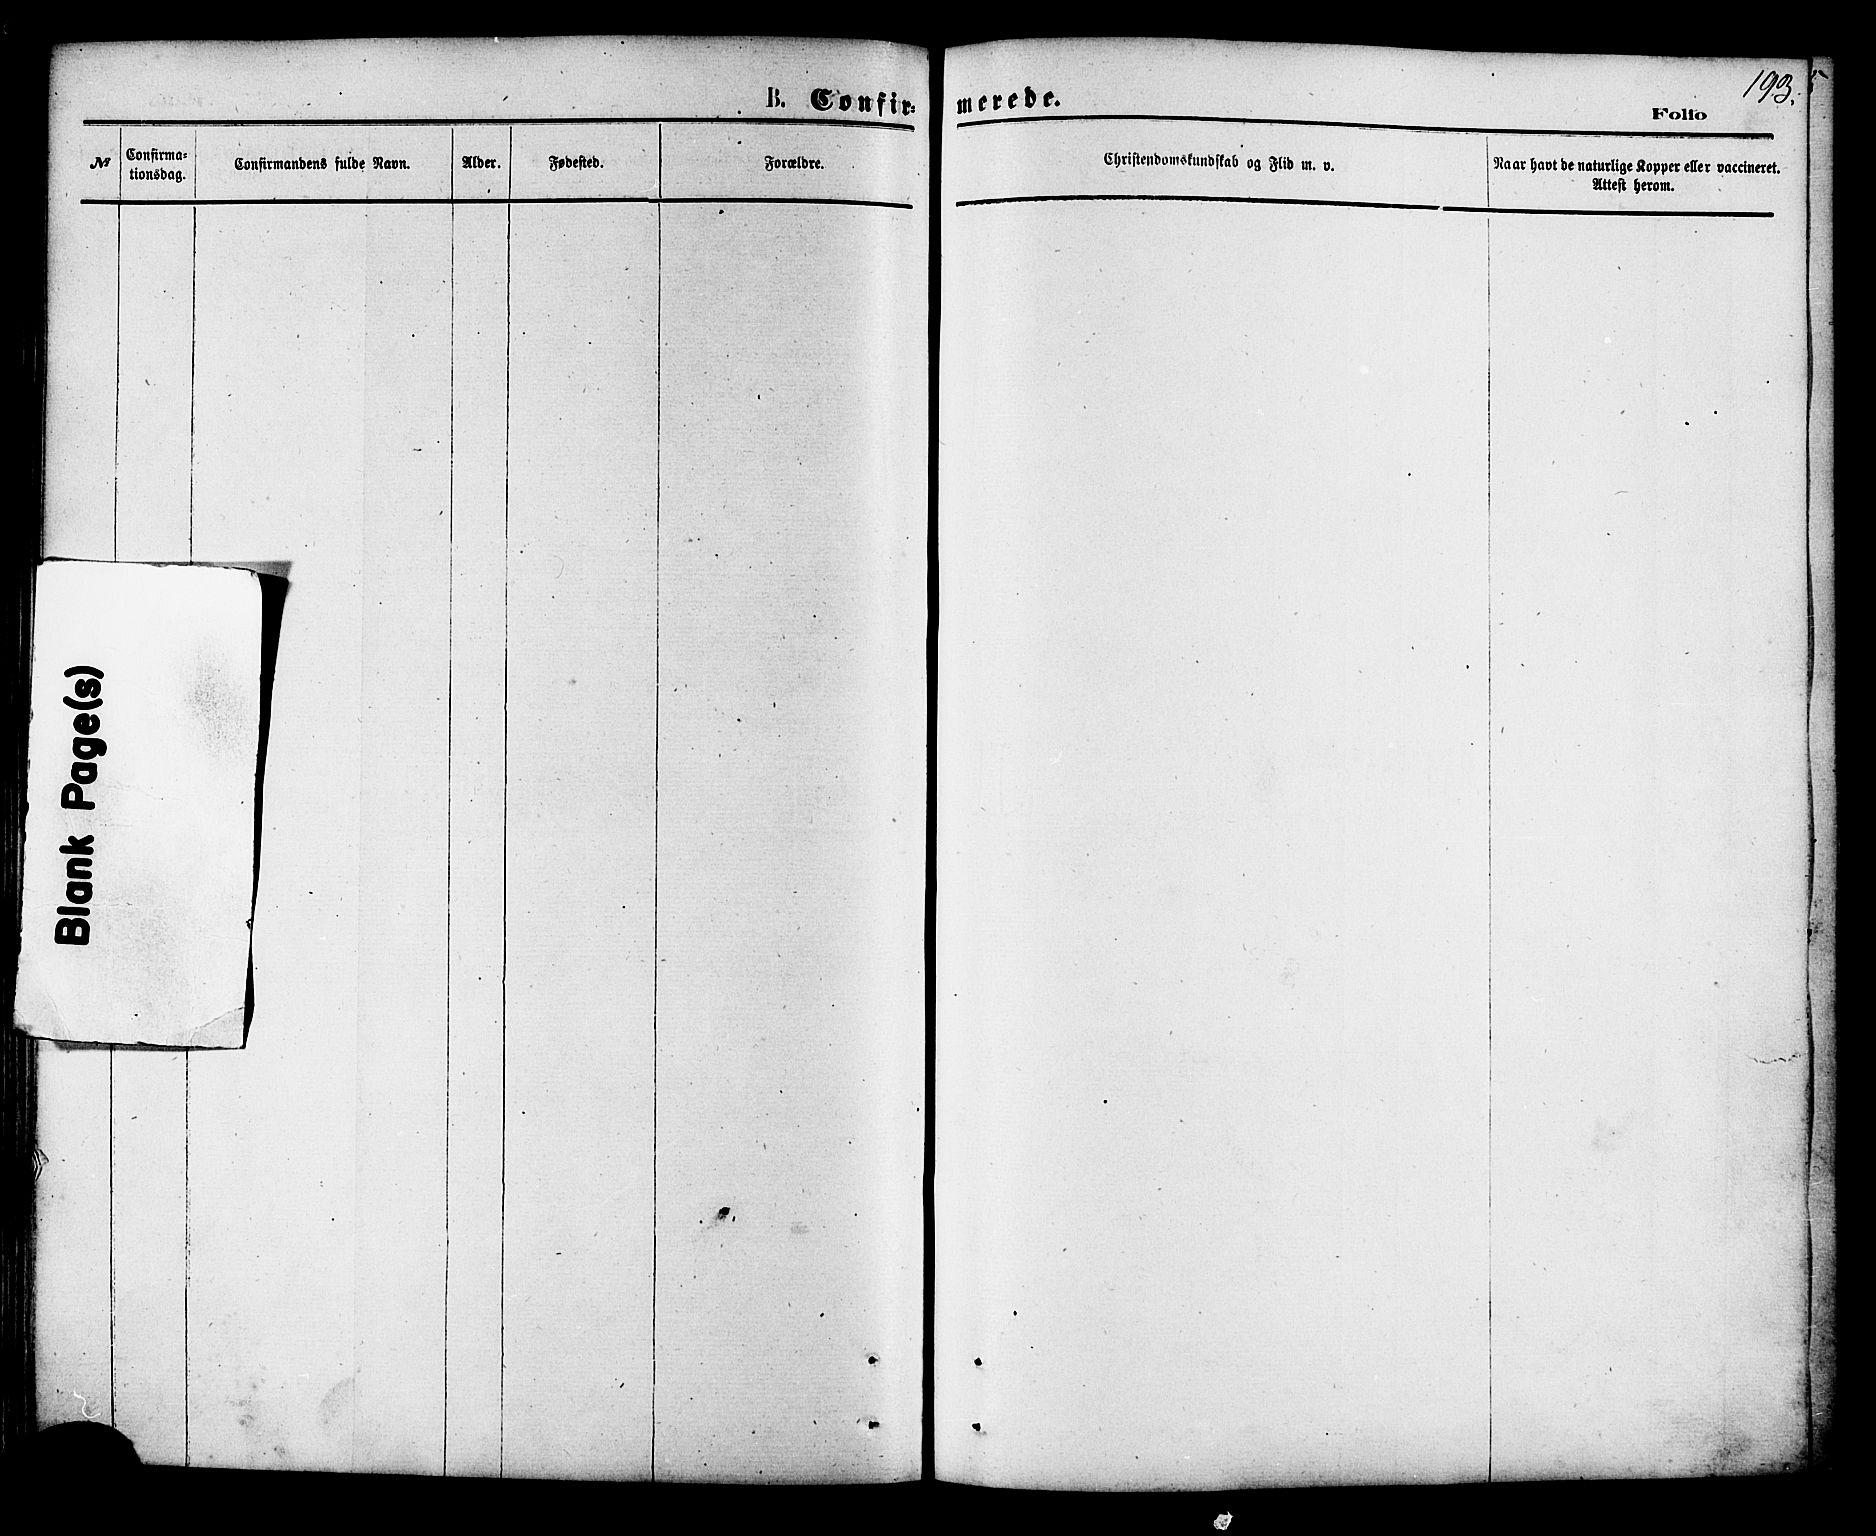 SAT, Ministerialprotokoller, klokkerbøker og fødselsregistre - Nordland, 853/L0771: Ministerialbok nr. 853A10, 1870-1881, s. 193